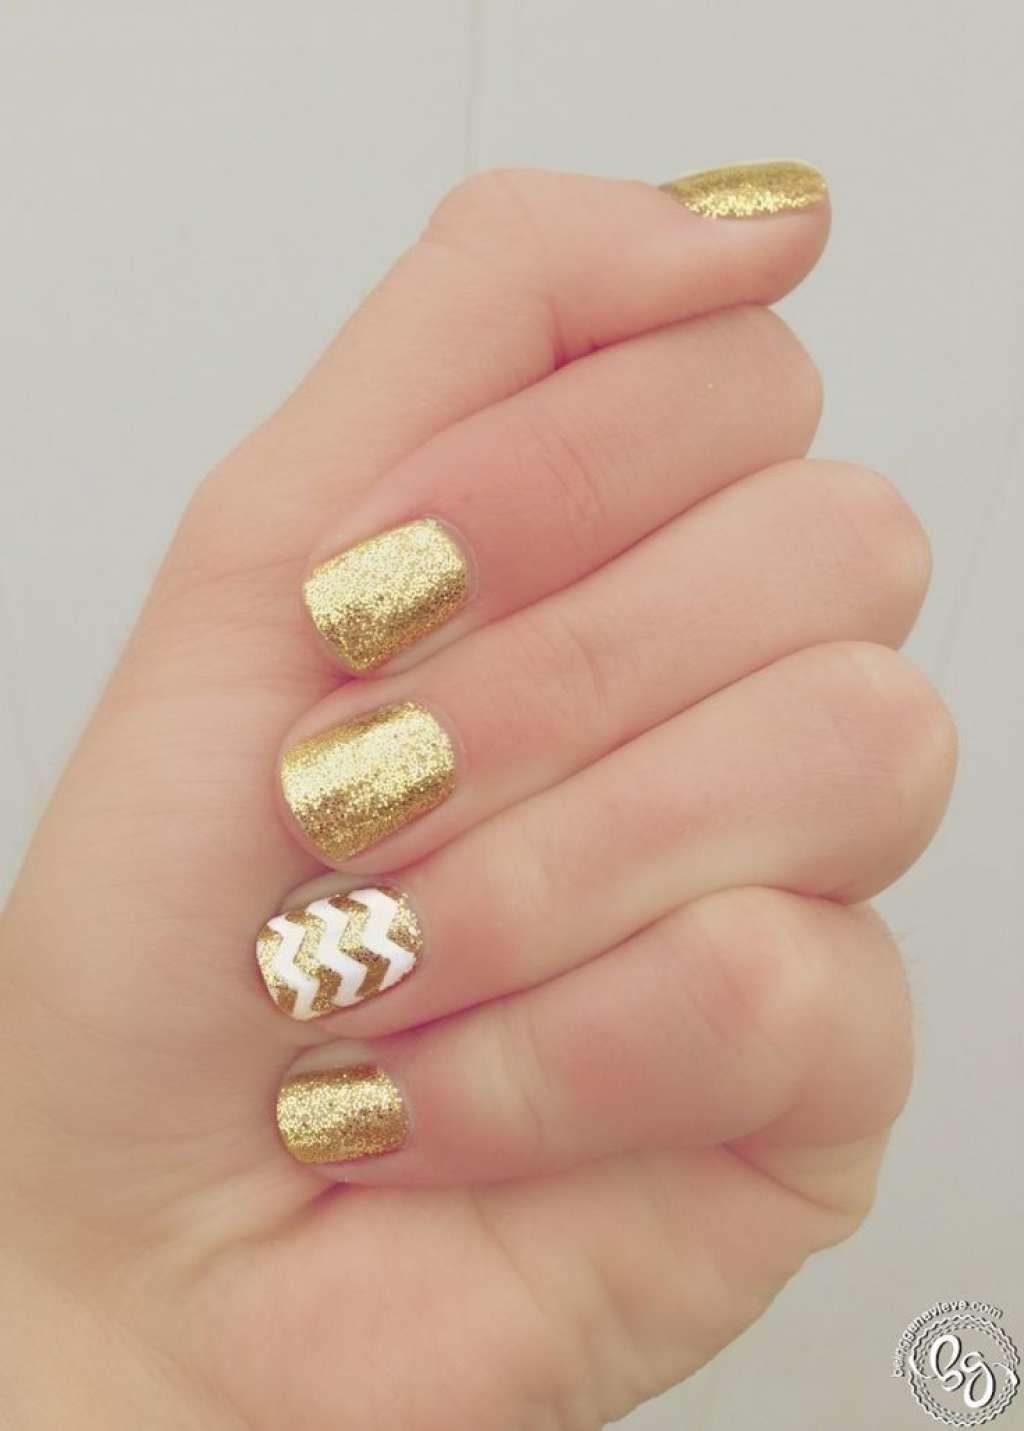 Рисунки на золотистом лаке на ногтях фото